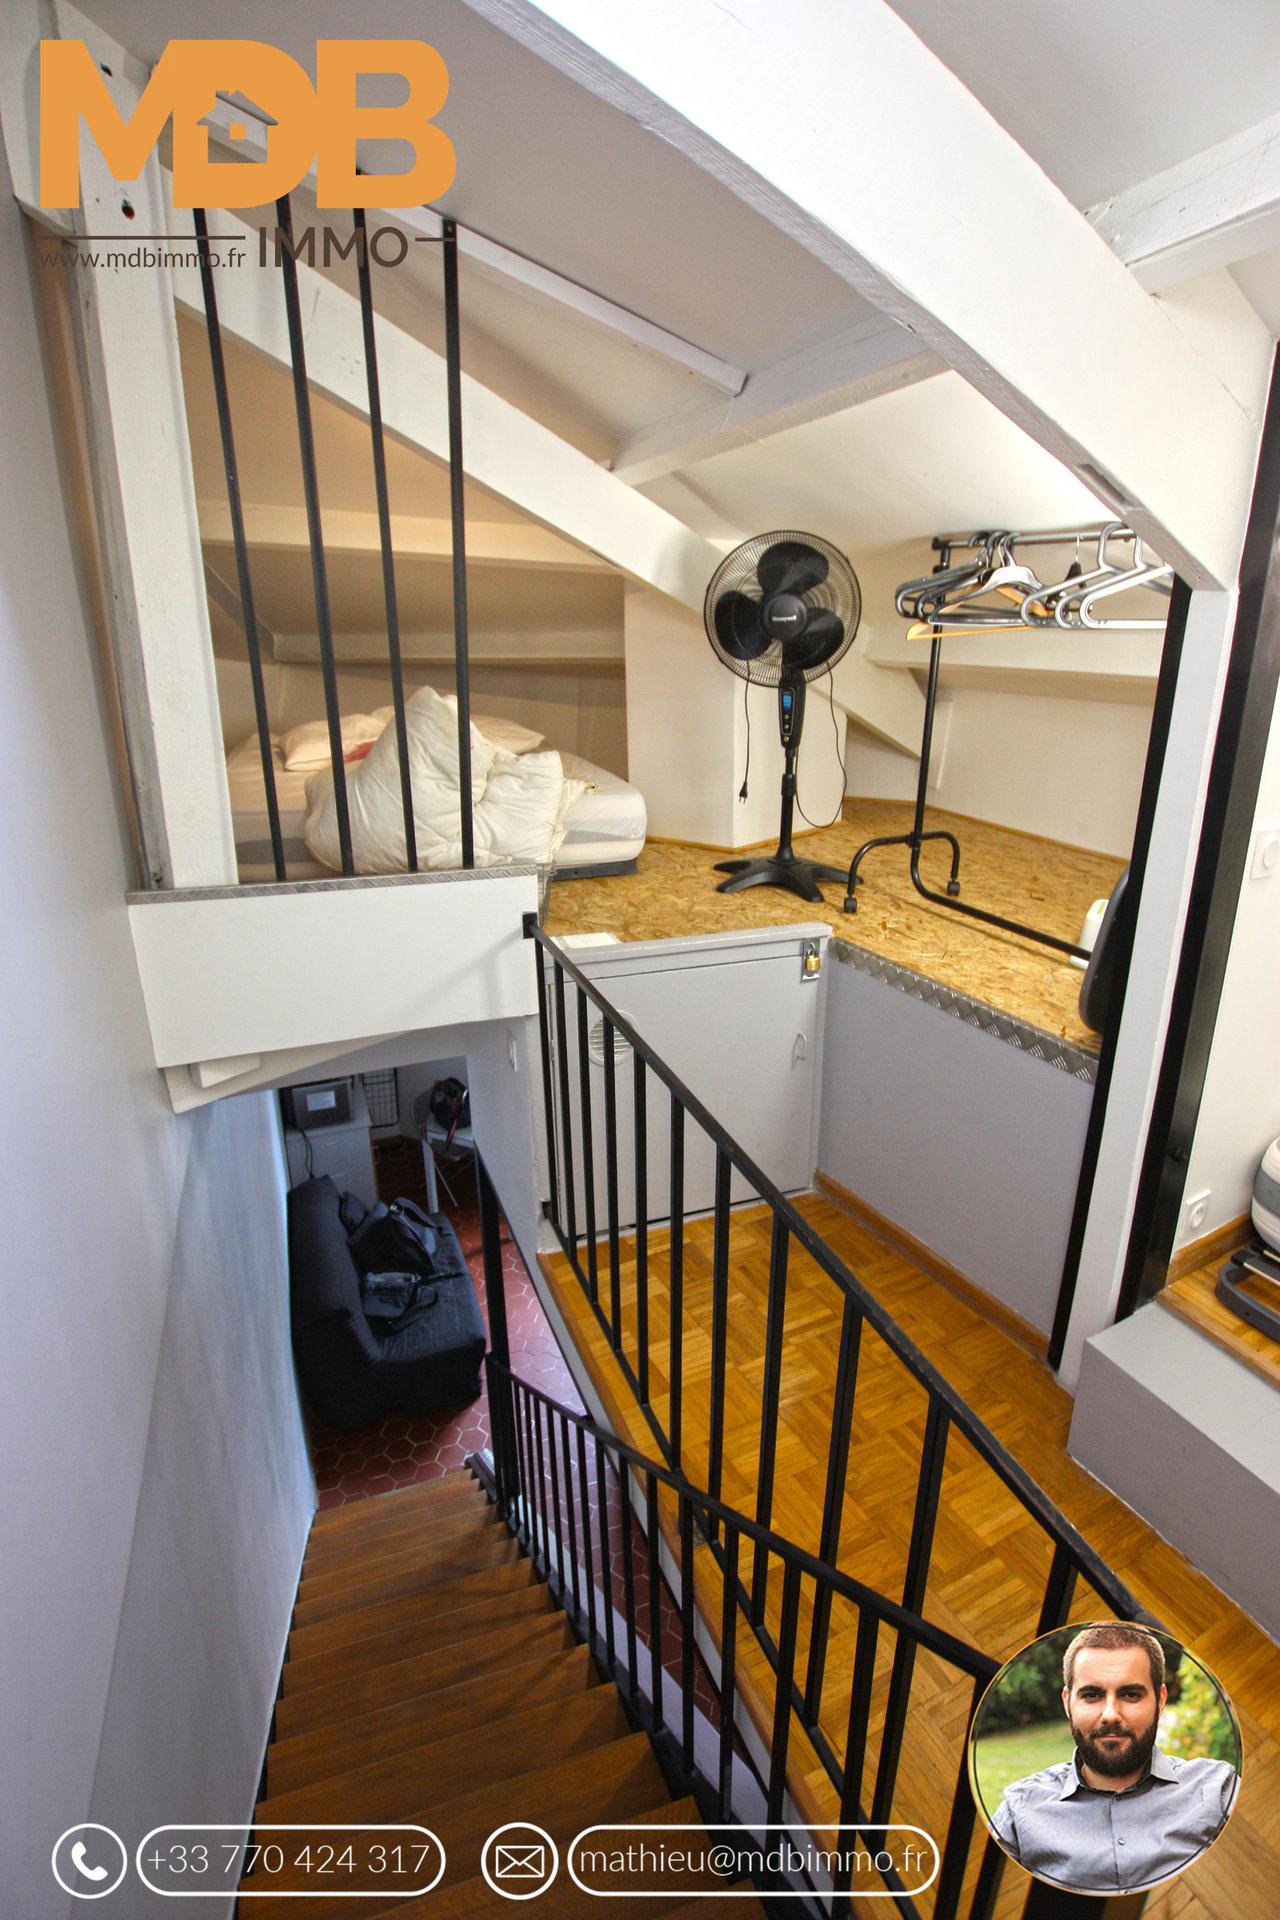 Nice - rue des potiers (Quartier Fleurs) - 2P ideal investor! 6.00% profitability GUARANTEED!